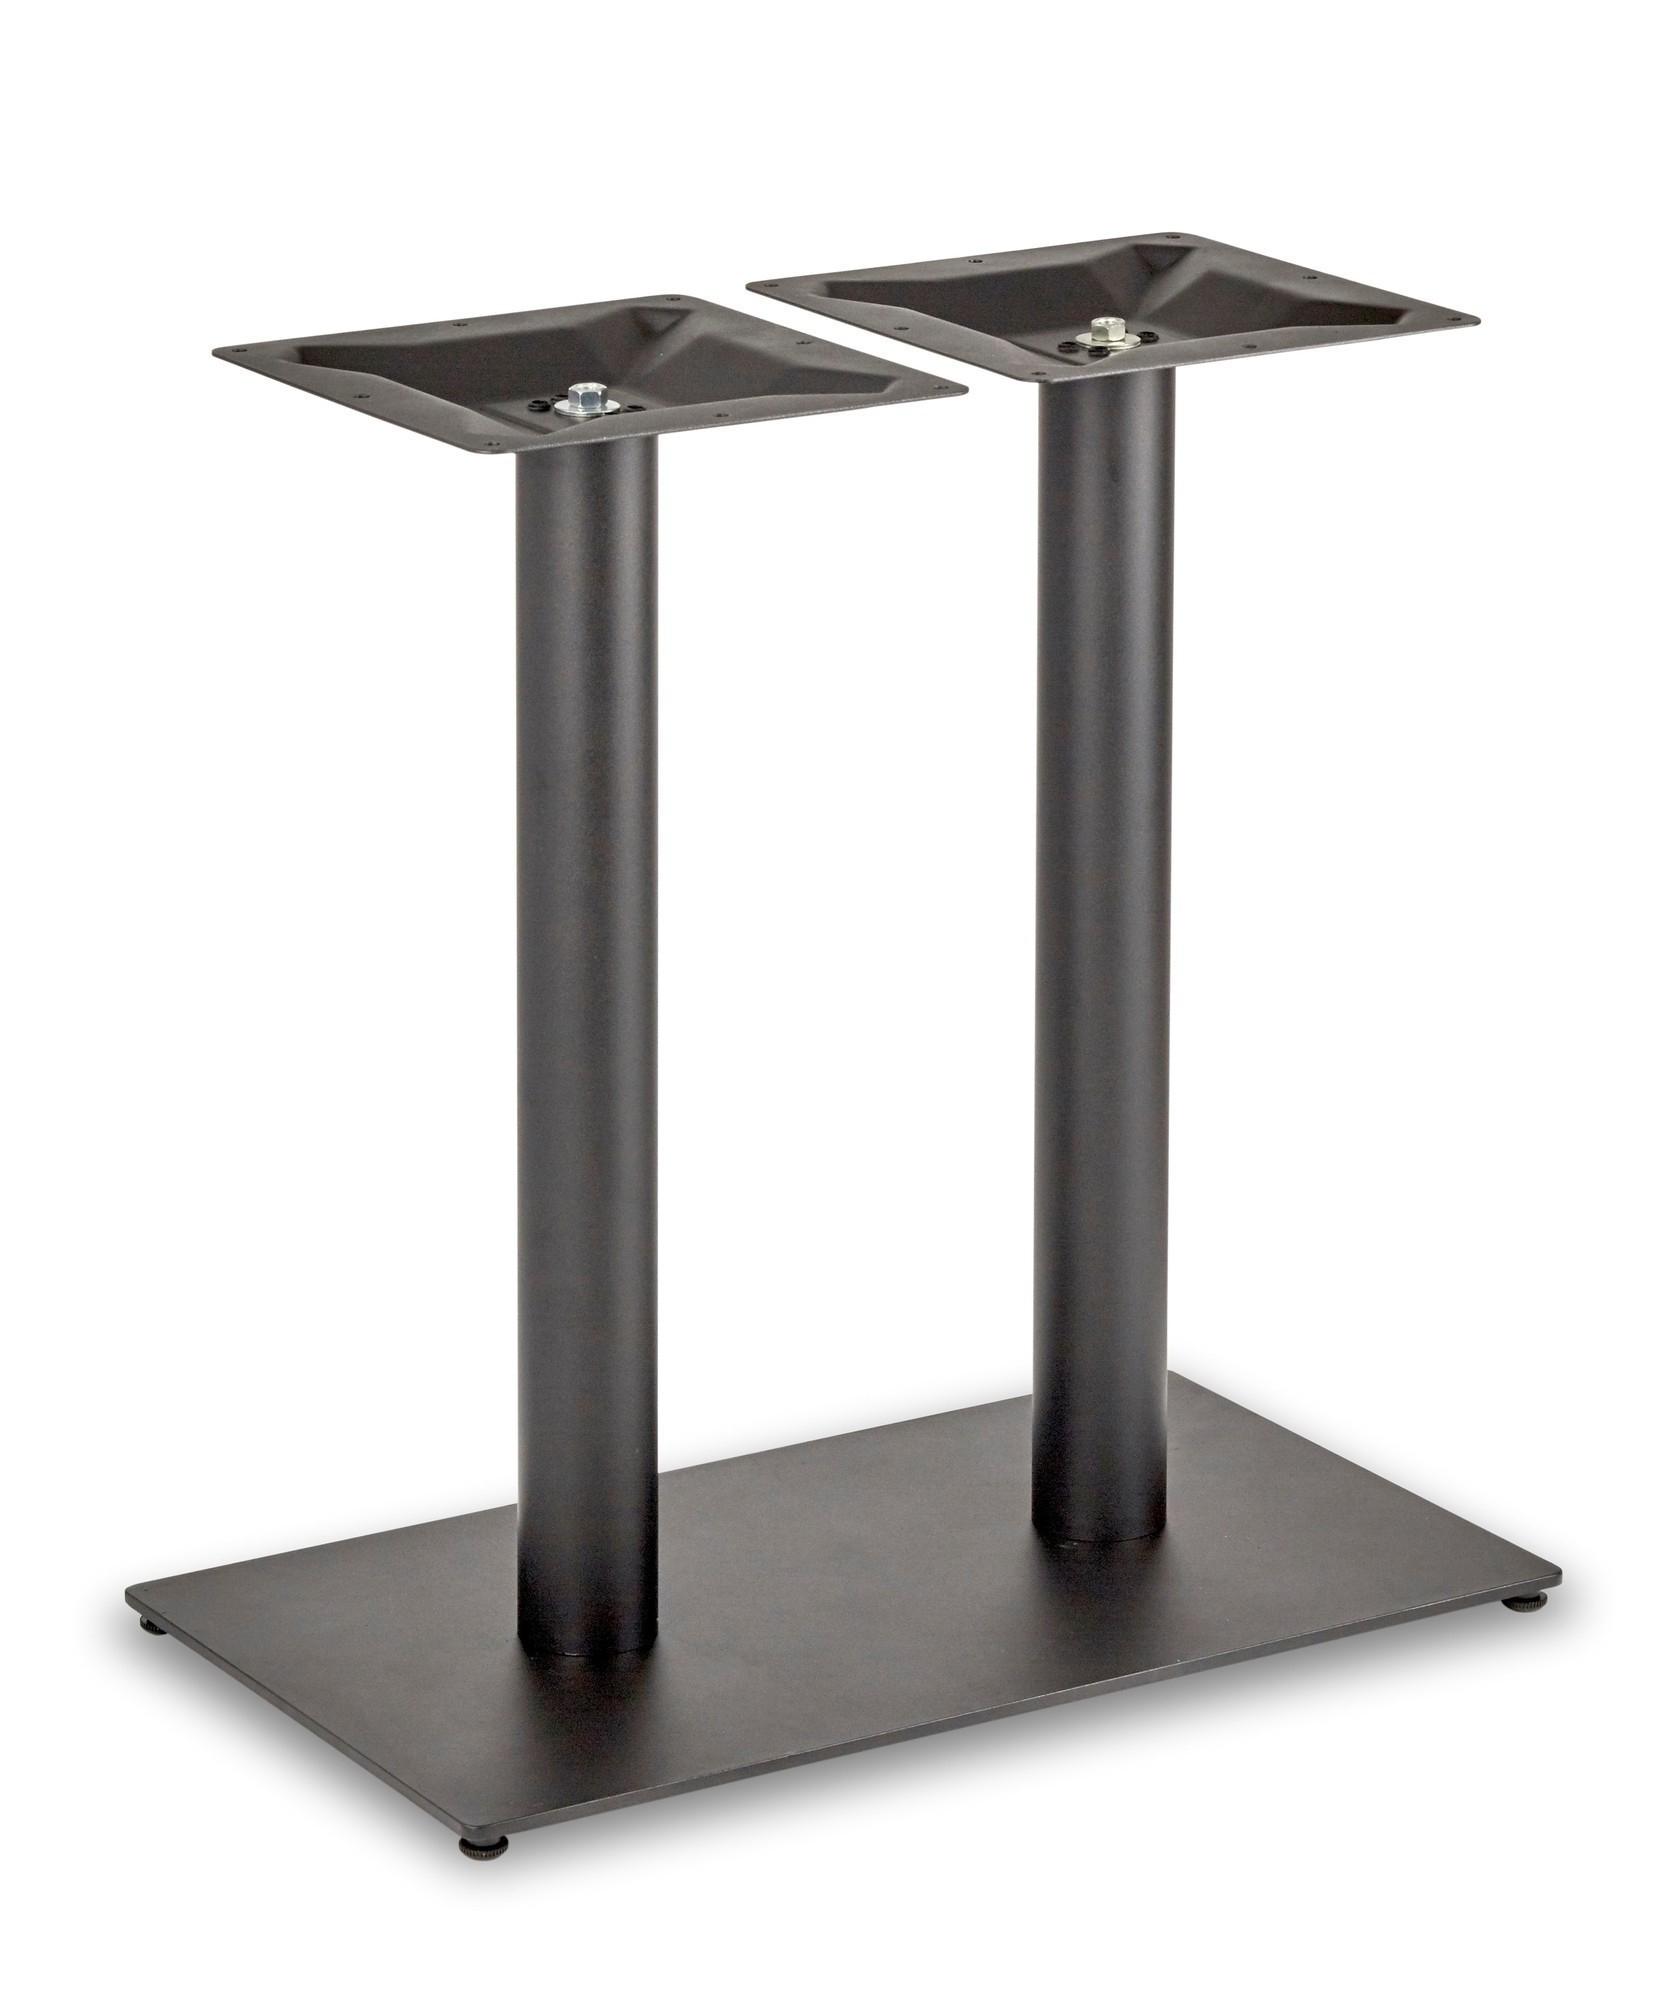 Circus Twin Pedestal Dining Table Rectangular Base Regarding Newest Serrato Pedestal Dining Tables (View 14 of 15)